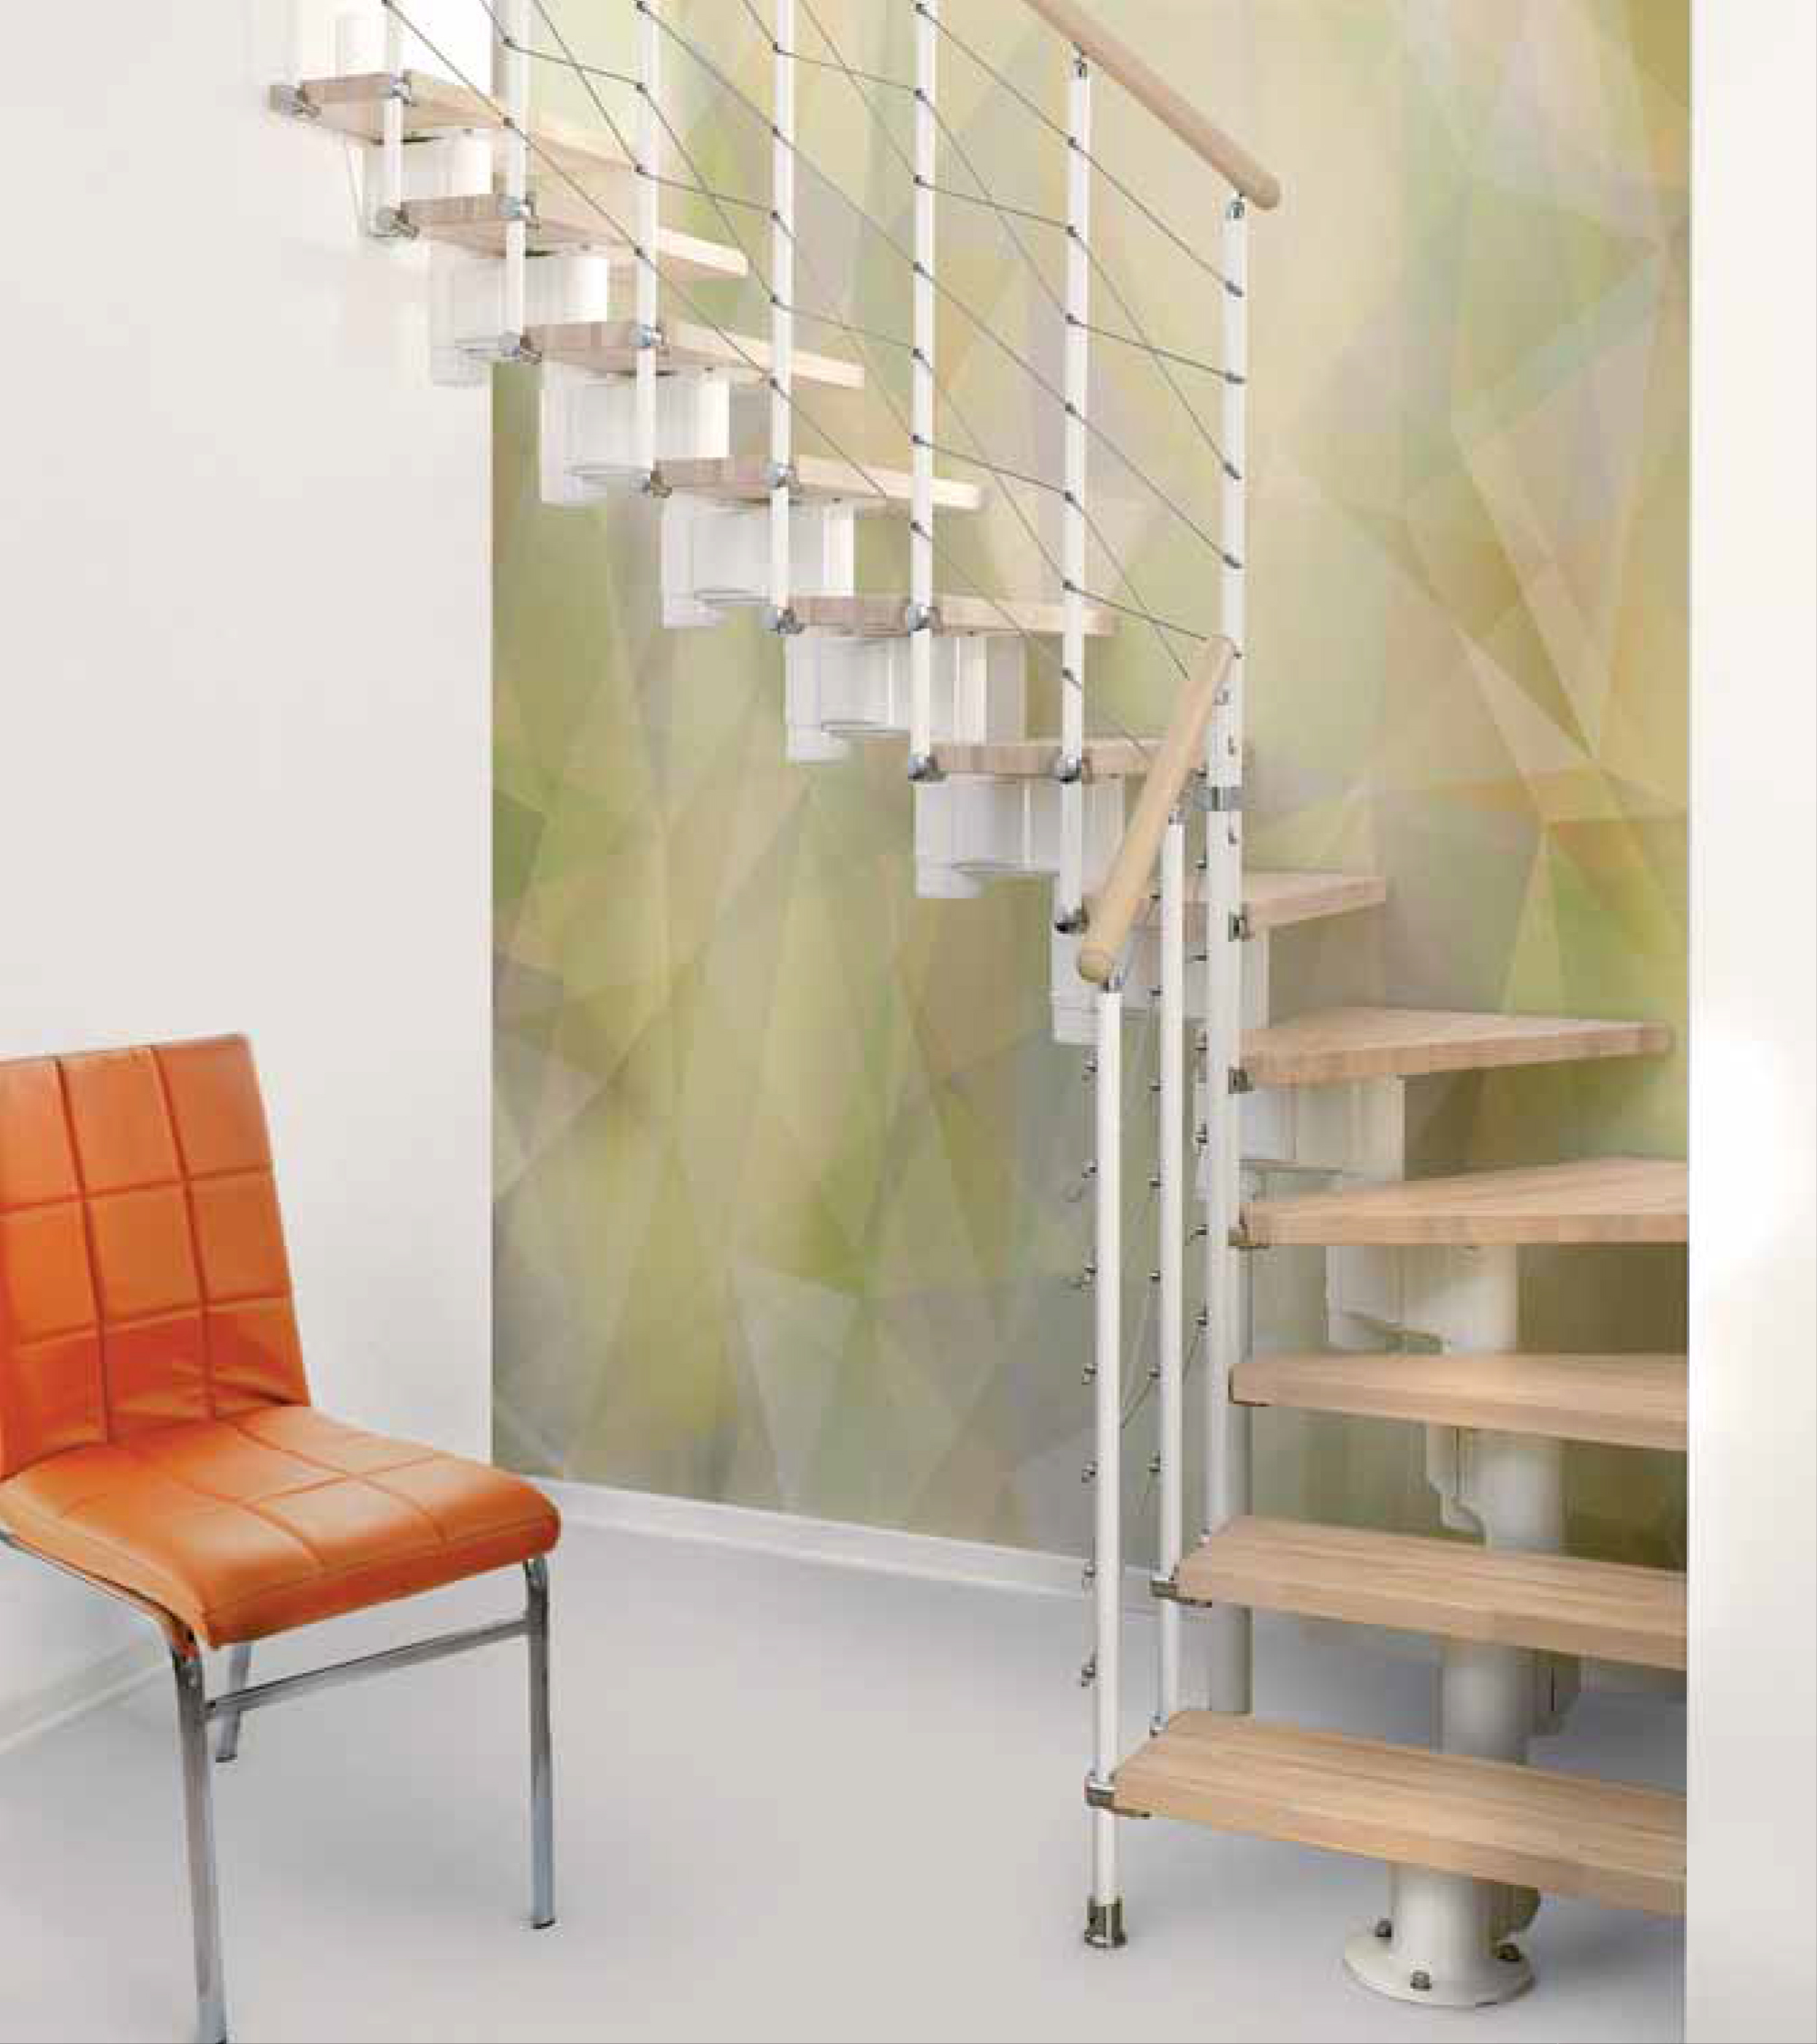 Produzione vendita e posa in opera di scale a rampa scale a giorno scale per interni scale - Scale per interni usate ...